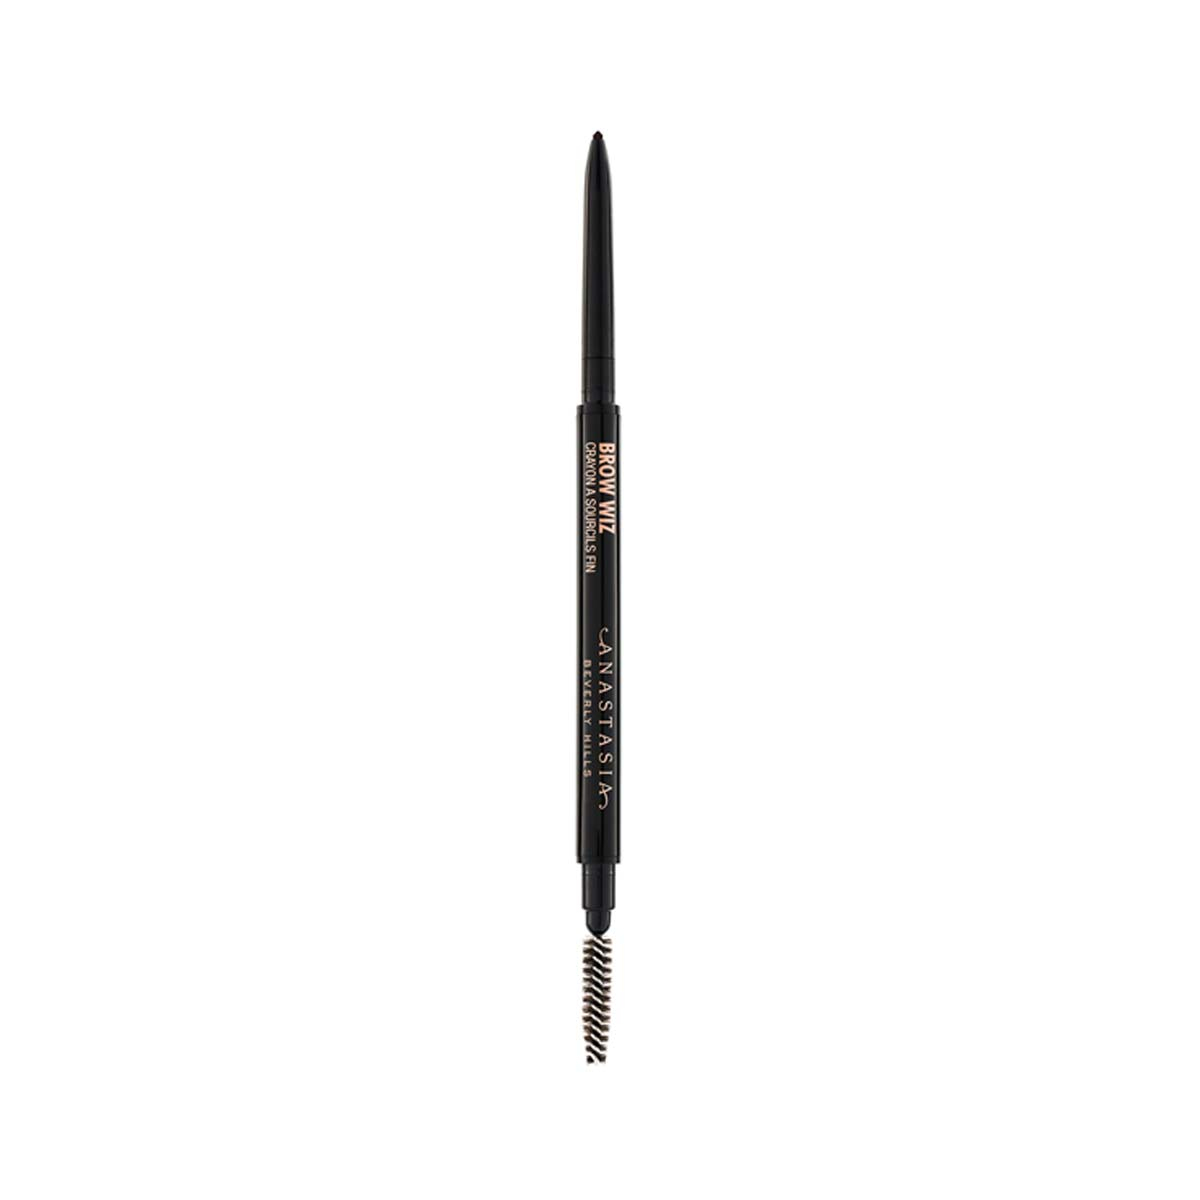 Brow Wiz Mechanical Brow Pencil